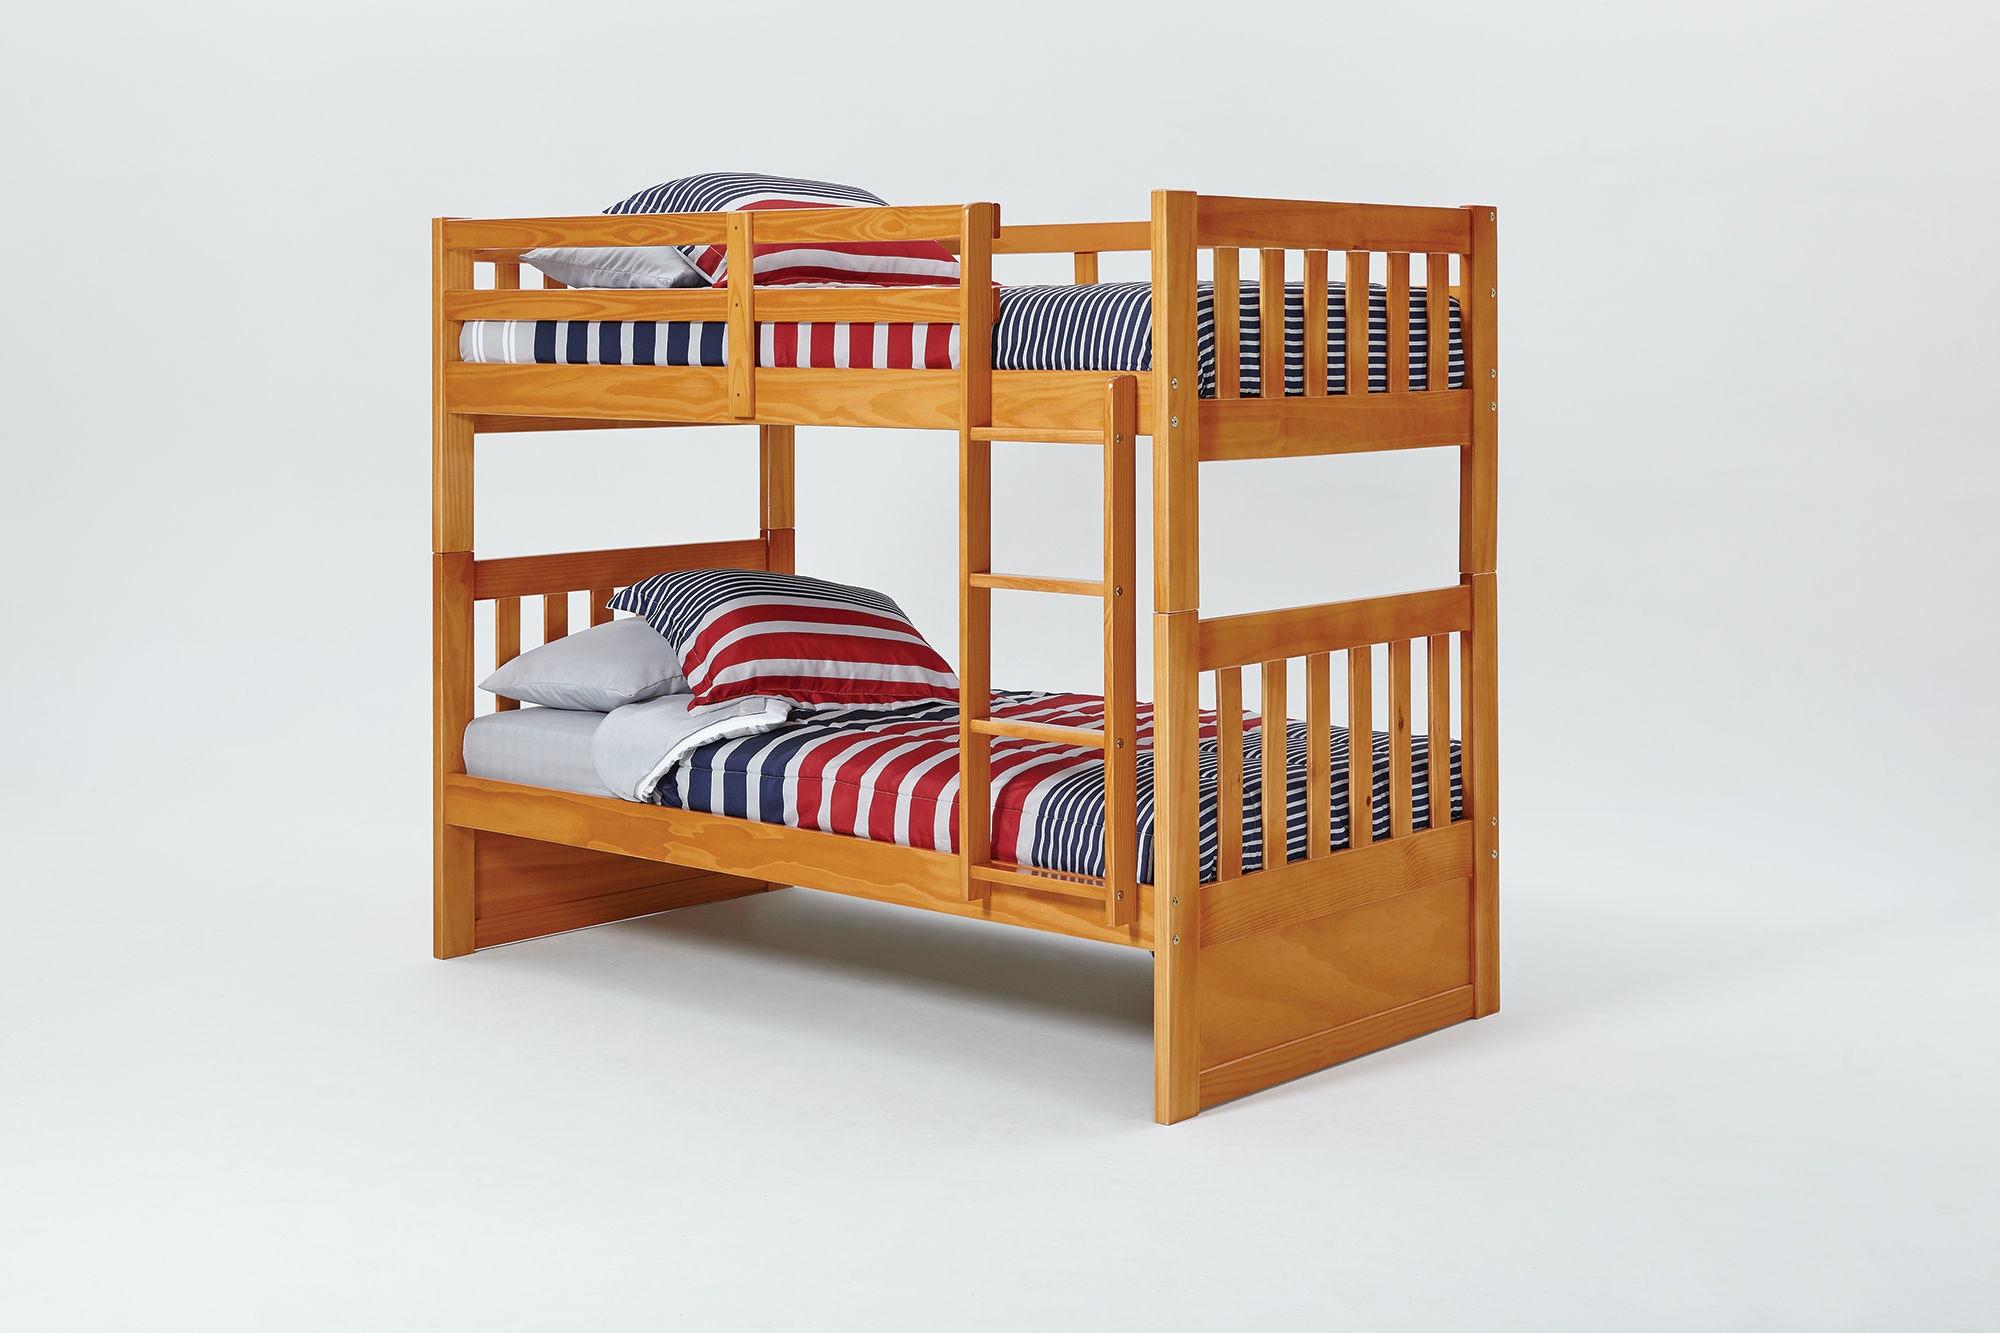 Woodcrest Beds Joe Tahan S Furniture Utica Rome Ny